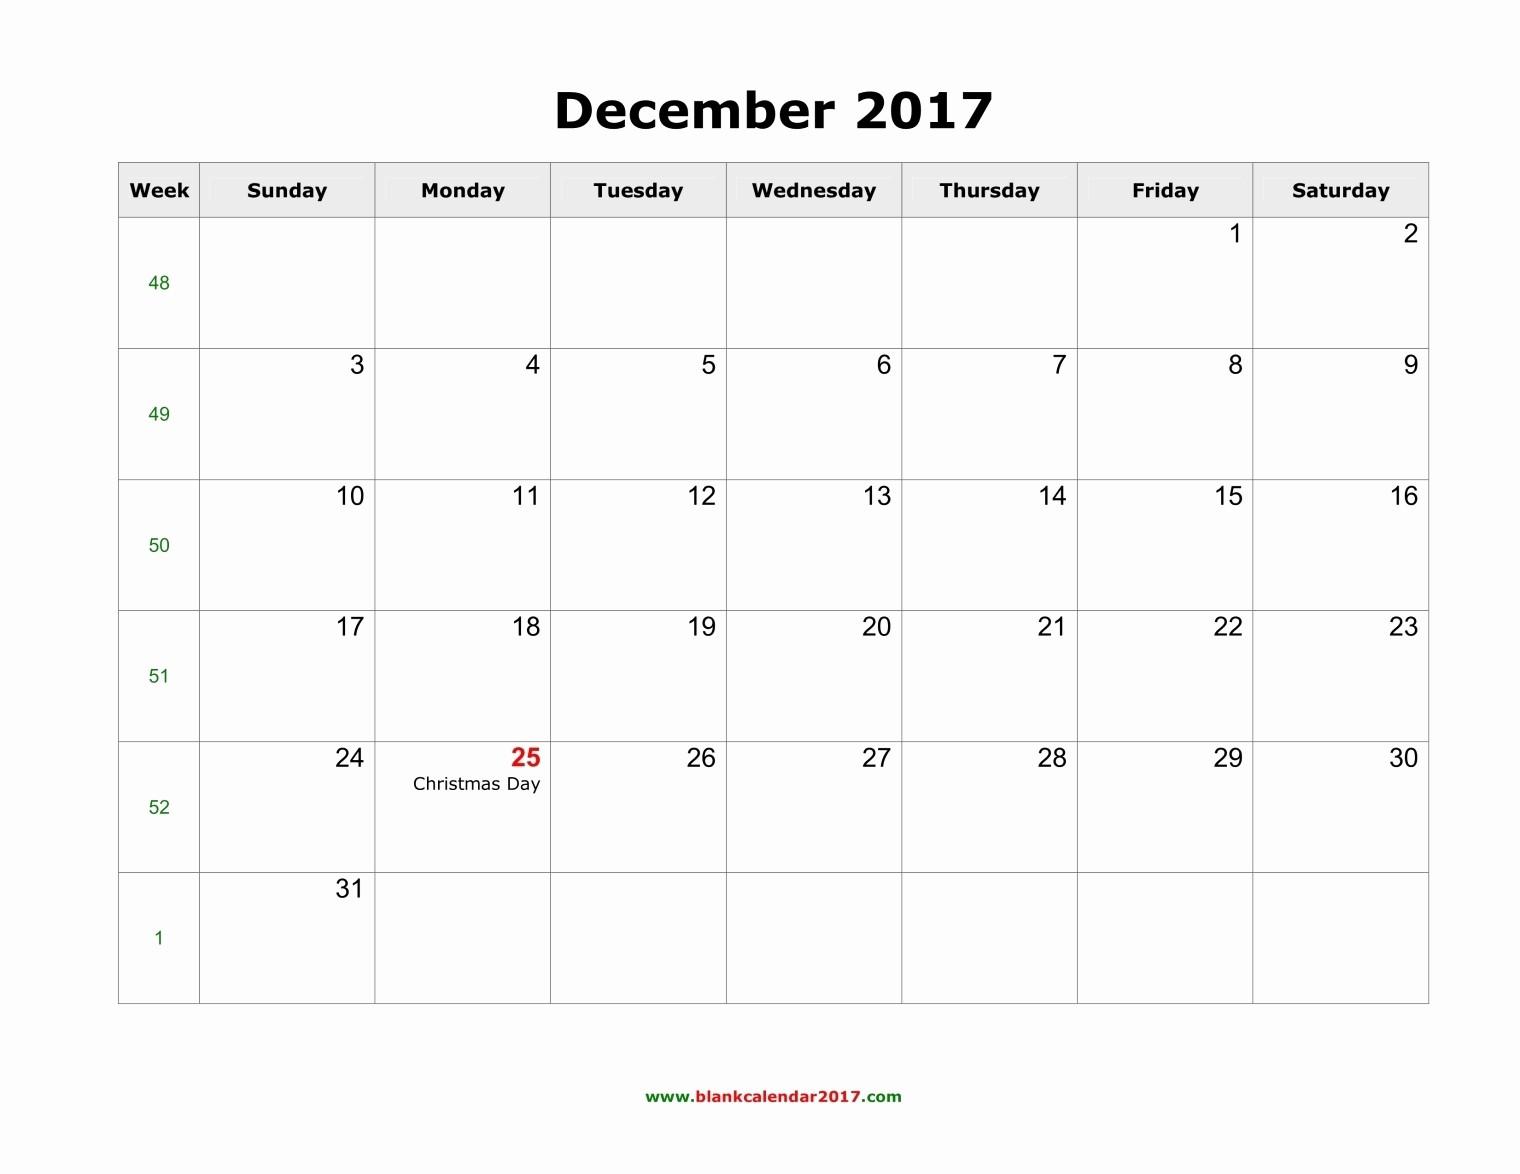 2017 Editable Calendar with Holidays Best Of December 2017 Calendar with Holidays